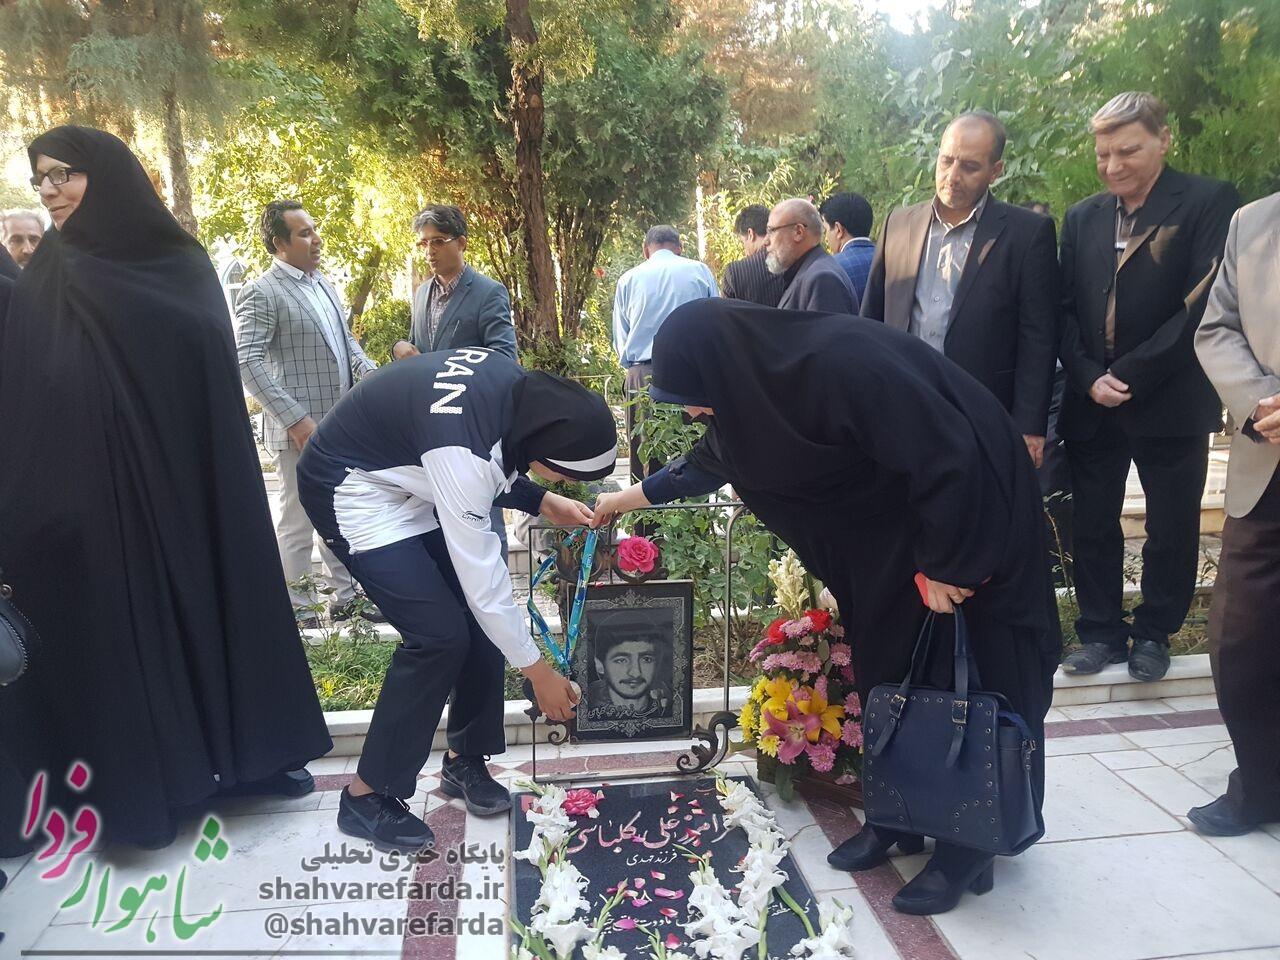 Photo of نایب قهرمان جهان مدال خود را تقدیم به شهید کلباسی کرد